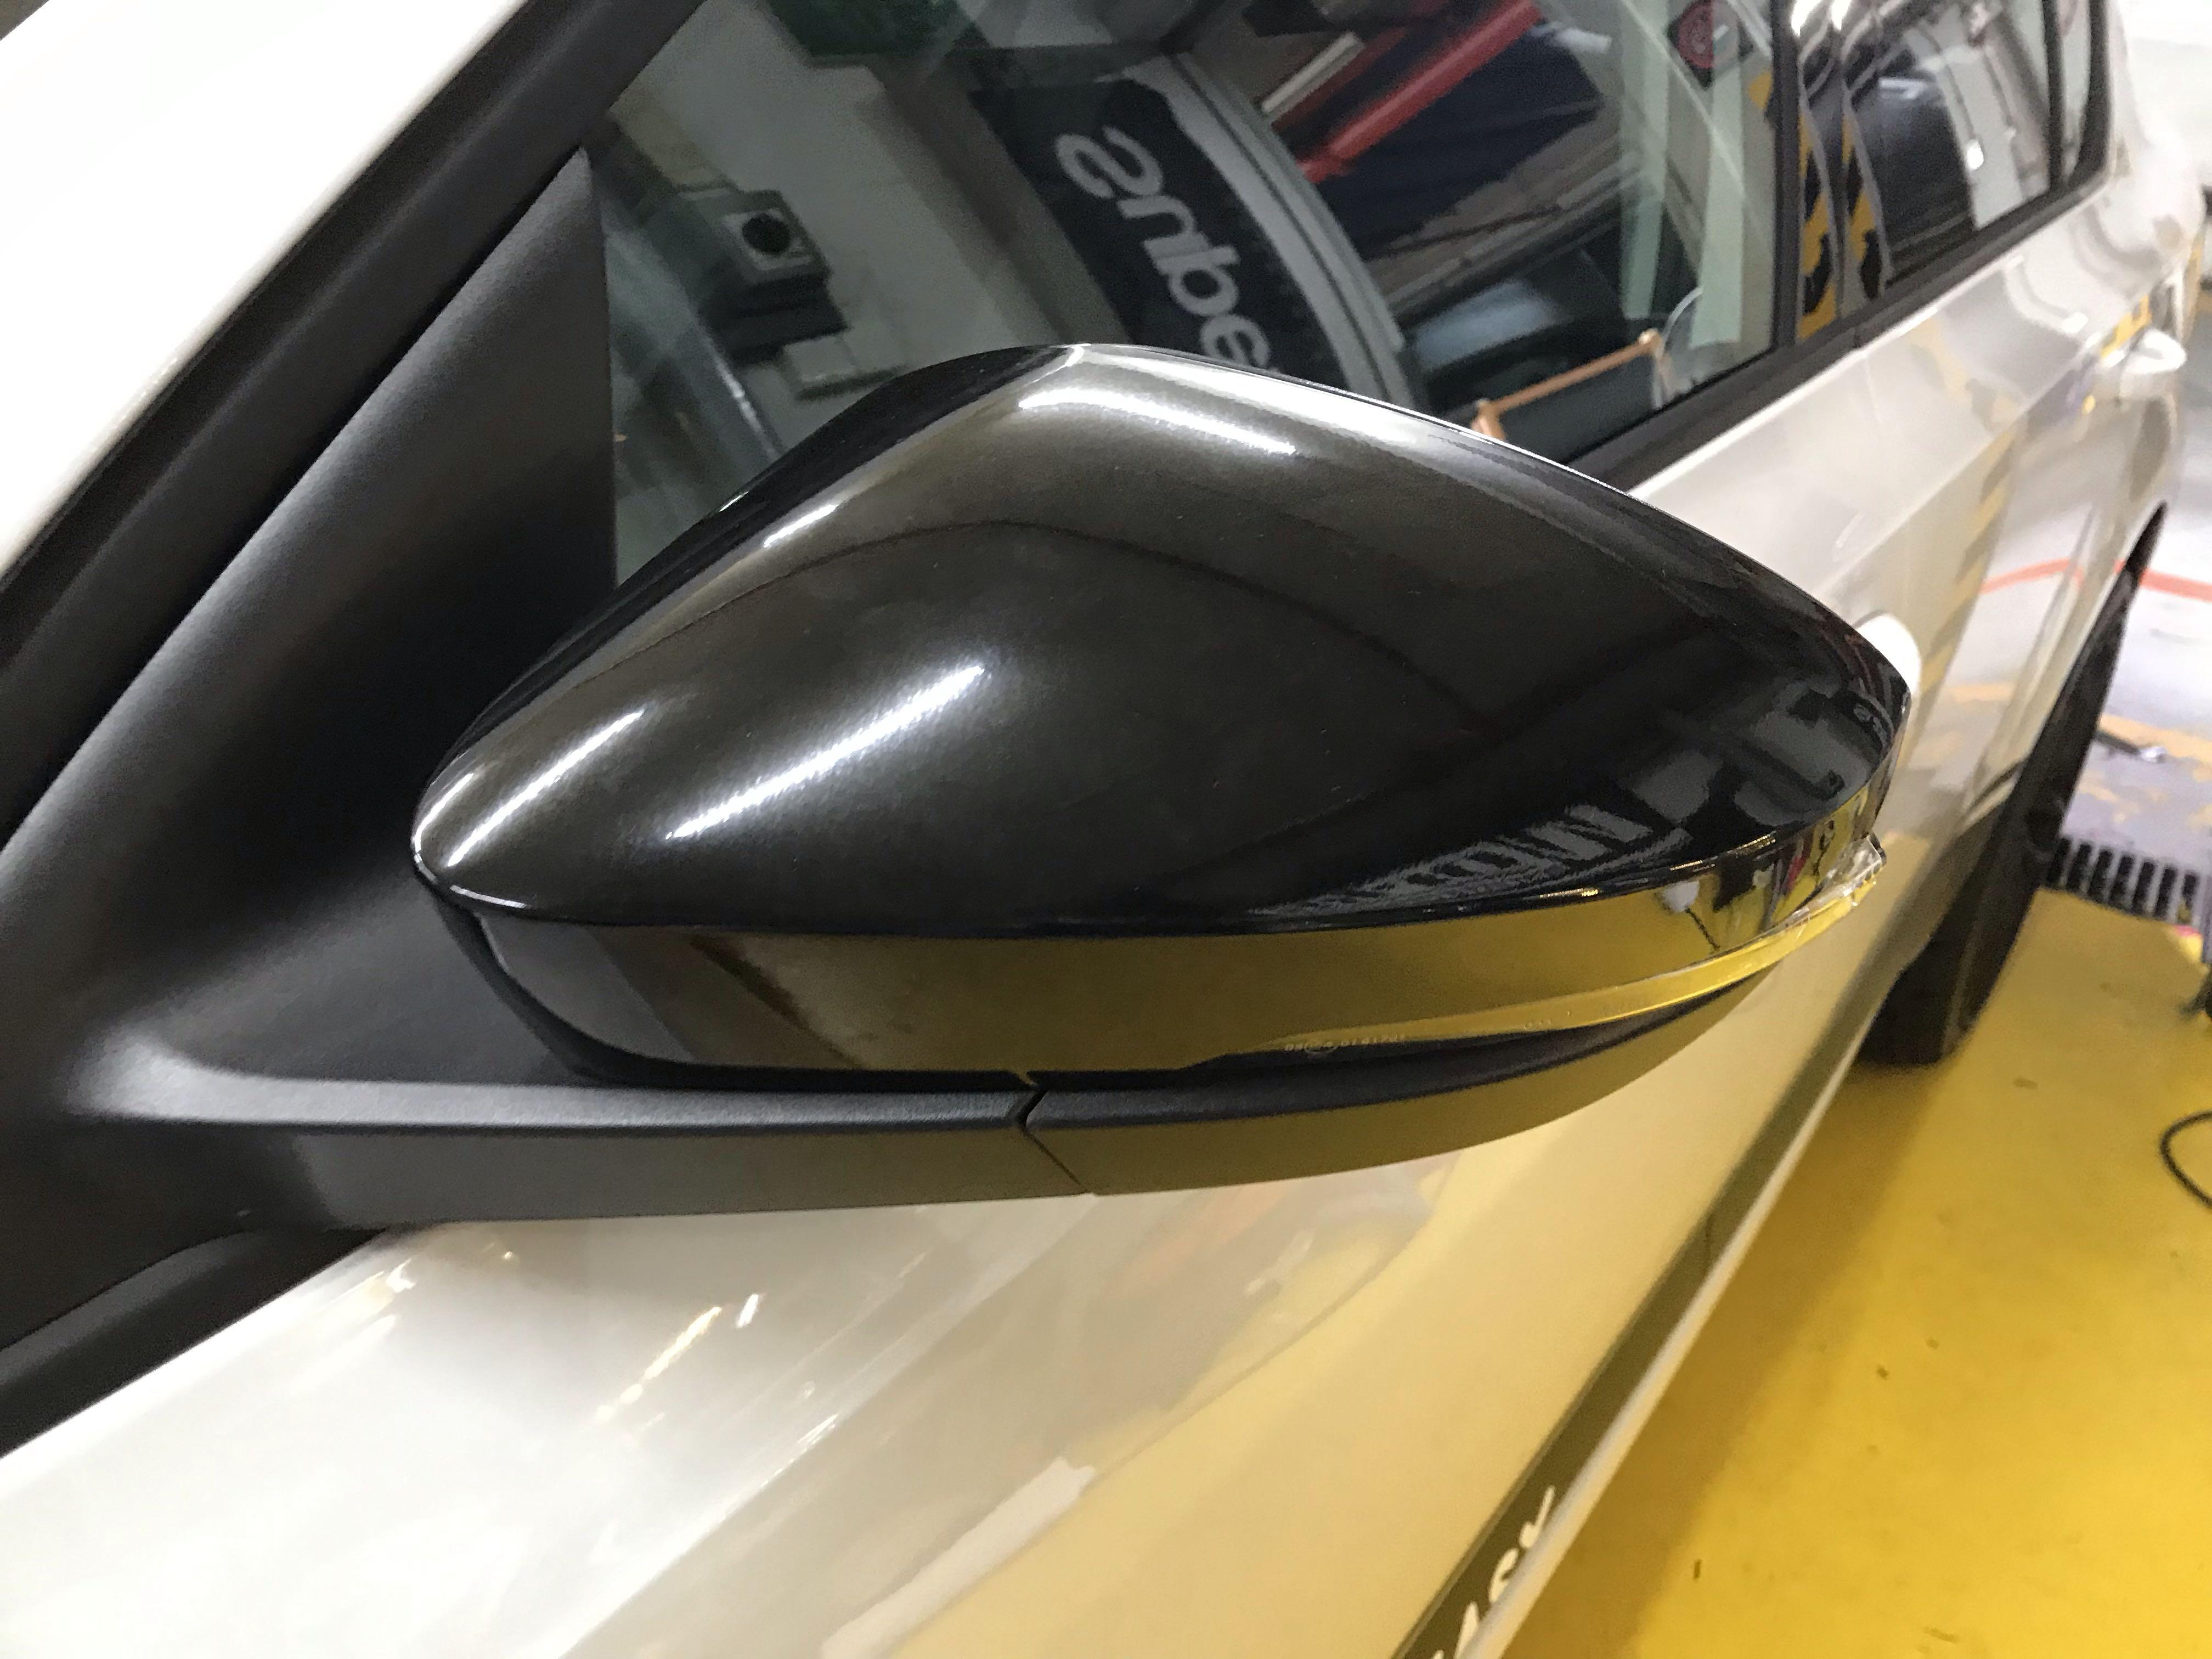 Skoda Octavia Side Mirror Gloss Black Wrap Car Accessories Accessories On Carousell